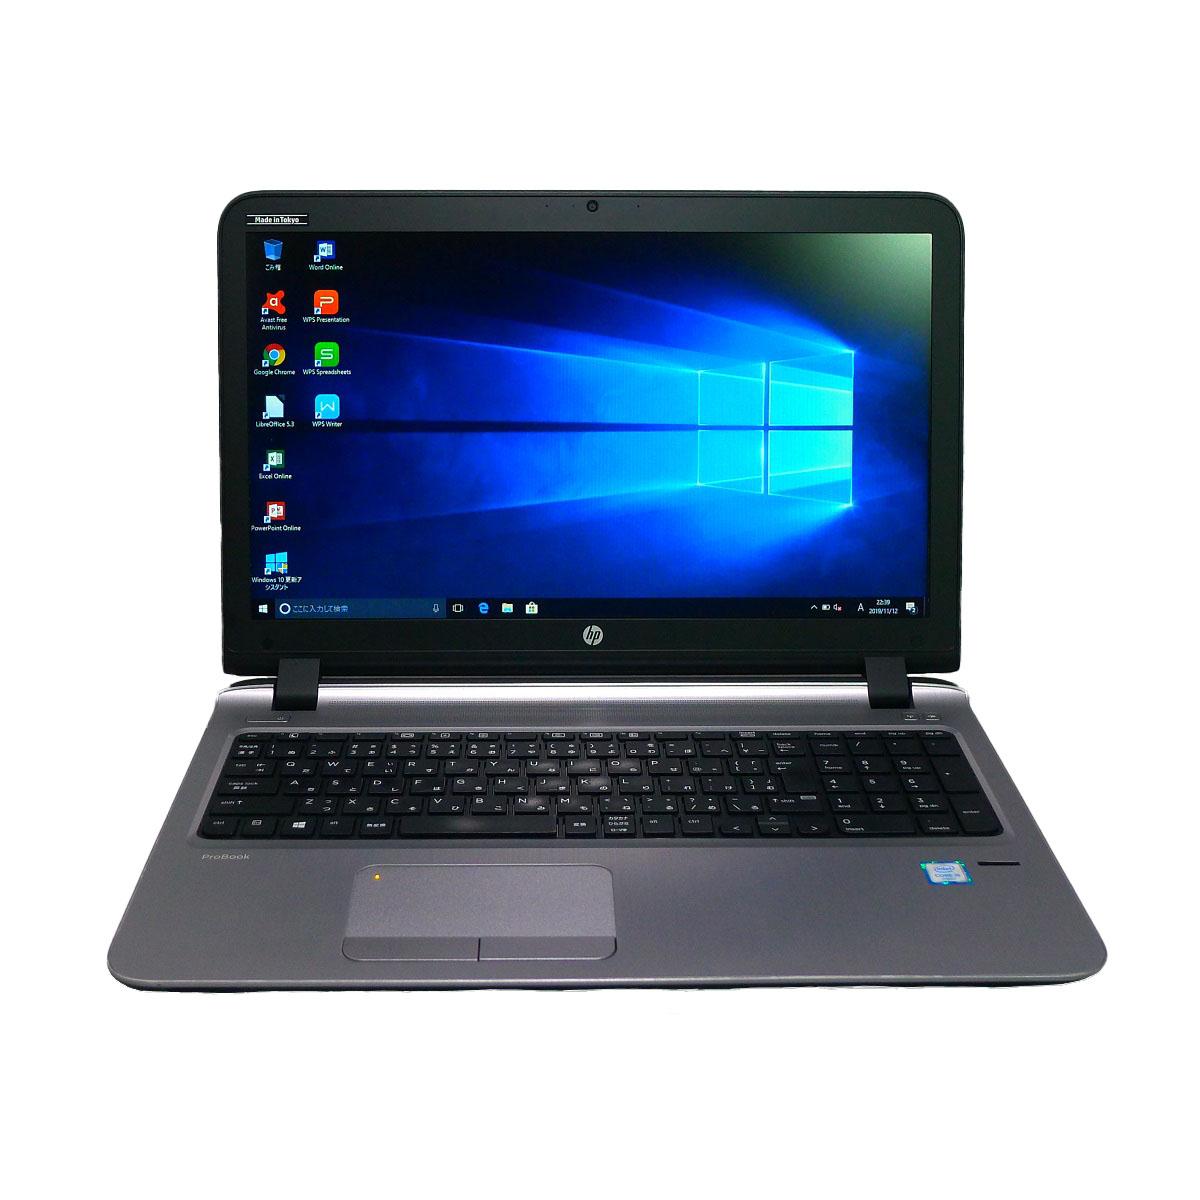 HP 休み ProBook 450 G3Celeron 期間限定特価品 16GB 新品SSD2TB DVD-ROM 15.6インチ 無線LAN 中古パソコン 64bitWPSOffice ノートパソコン 中古 Windows10